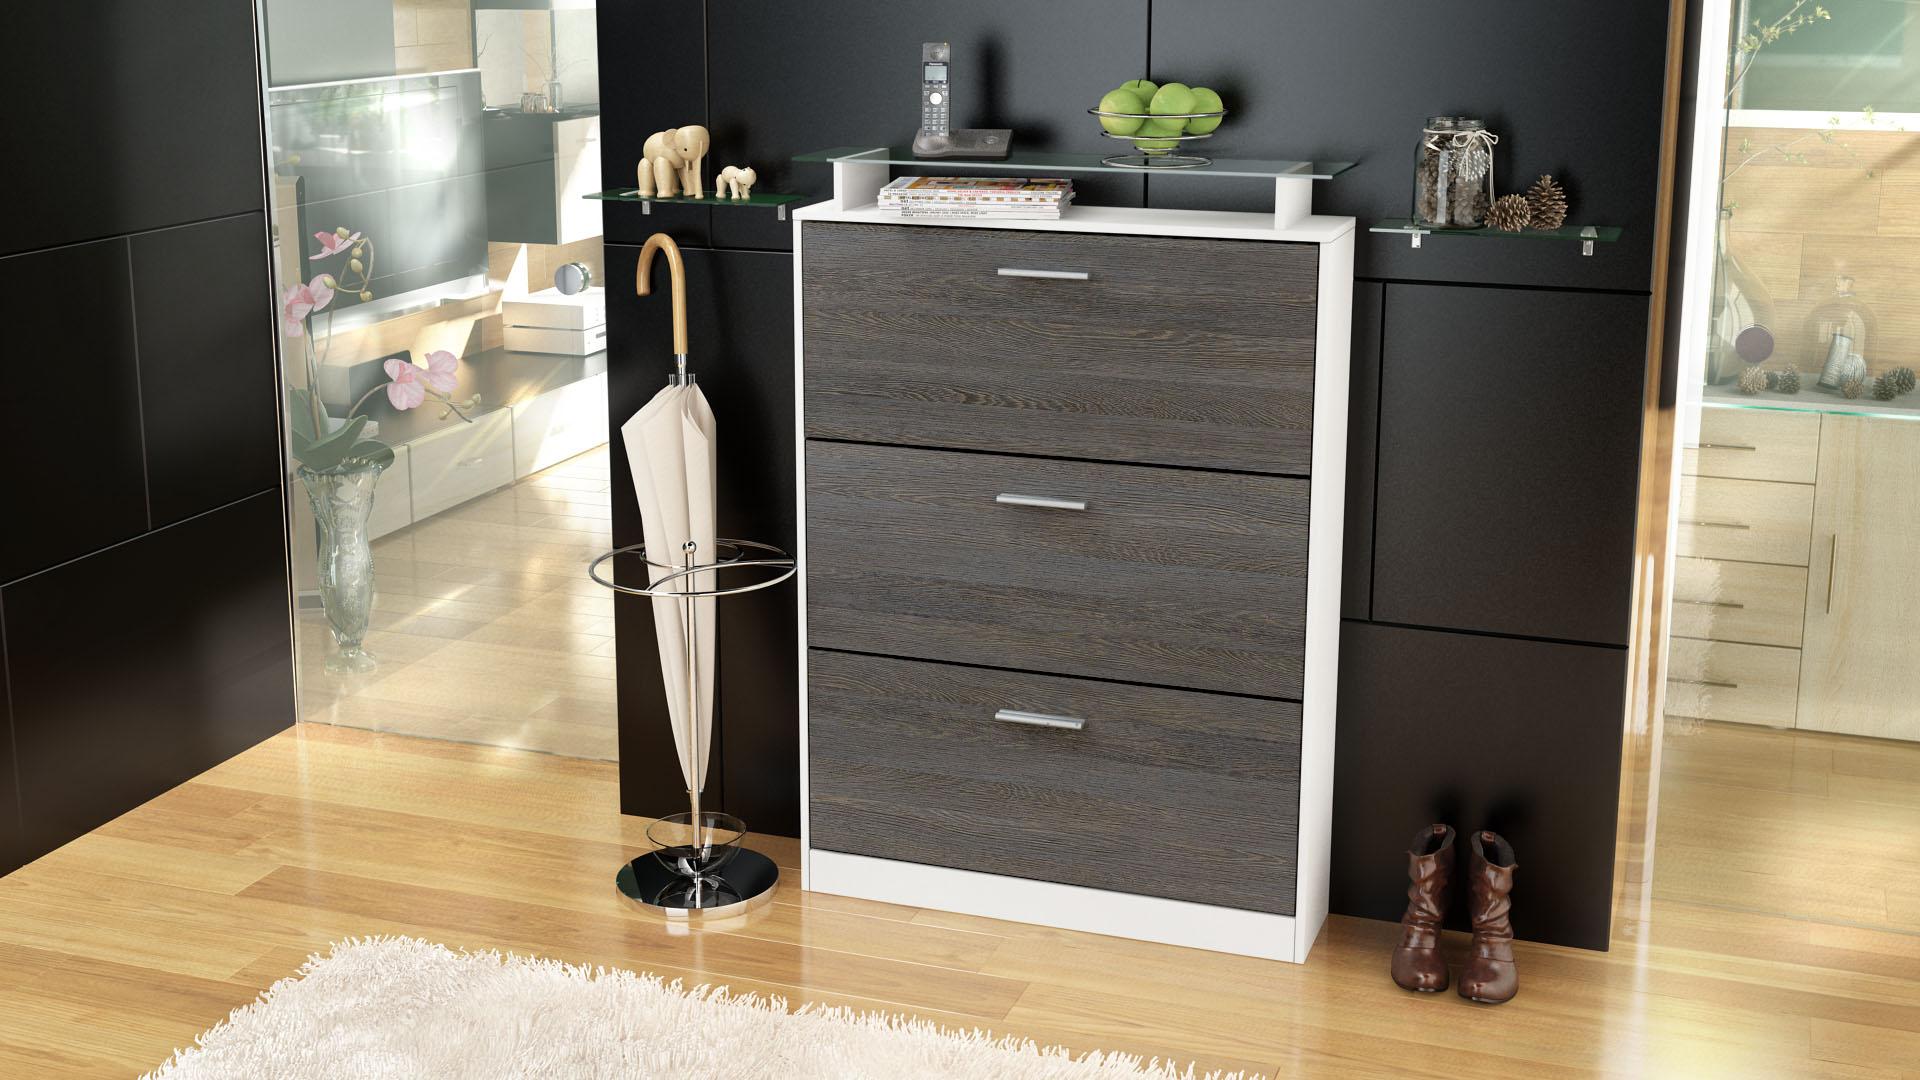 schuhschrank schuhkipper diele flur schrank lavia wei. Black Bedroom Furniture Sets. Home Design Ideas